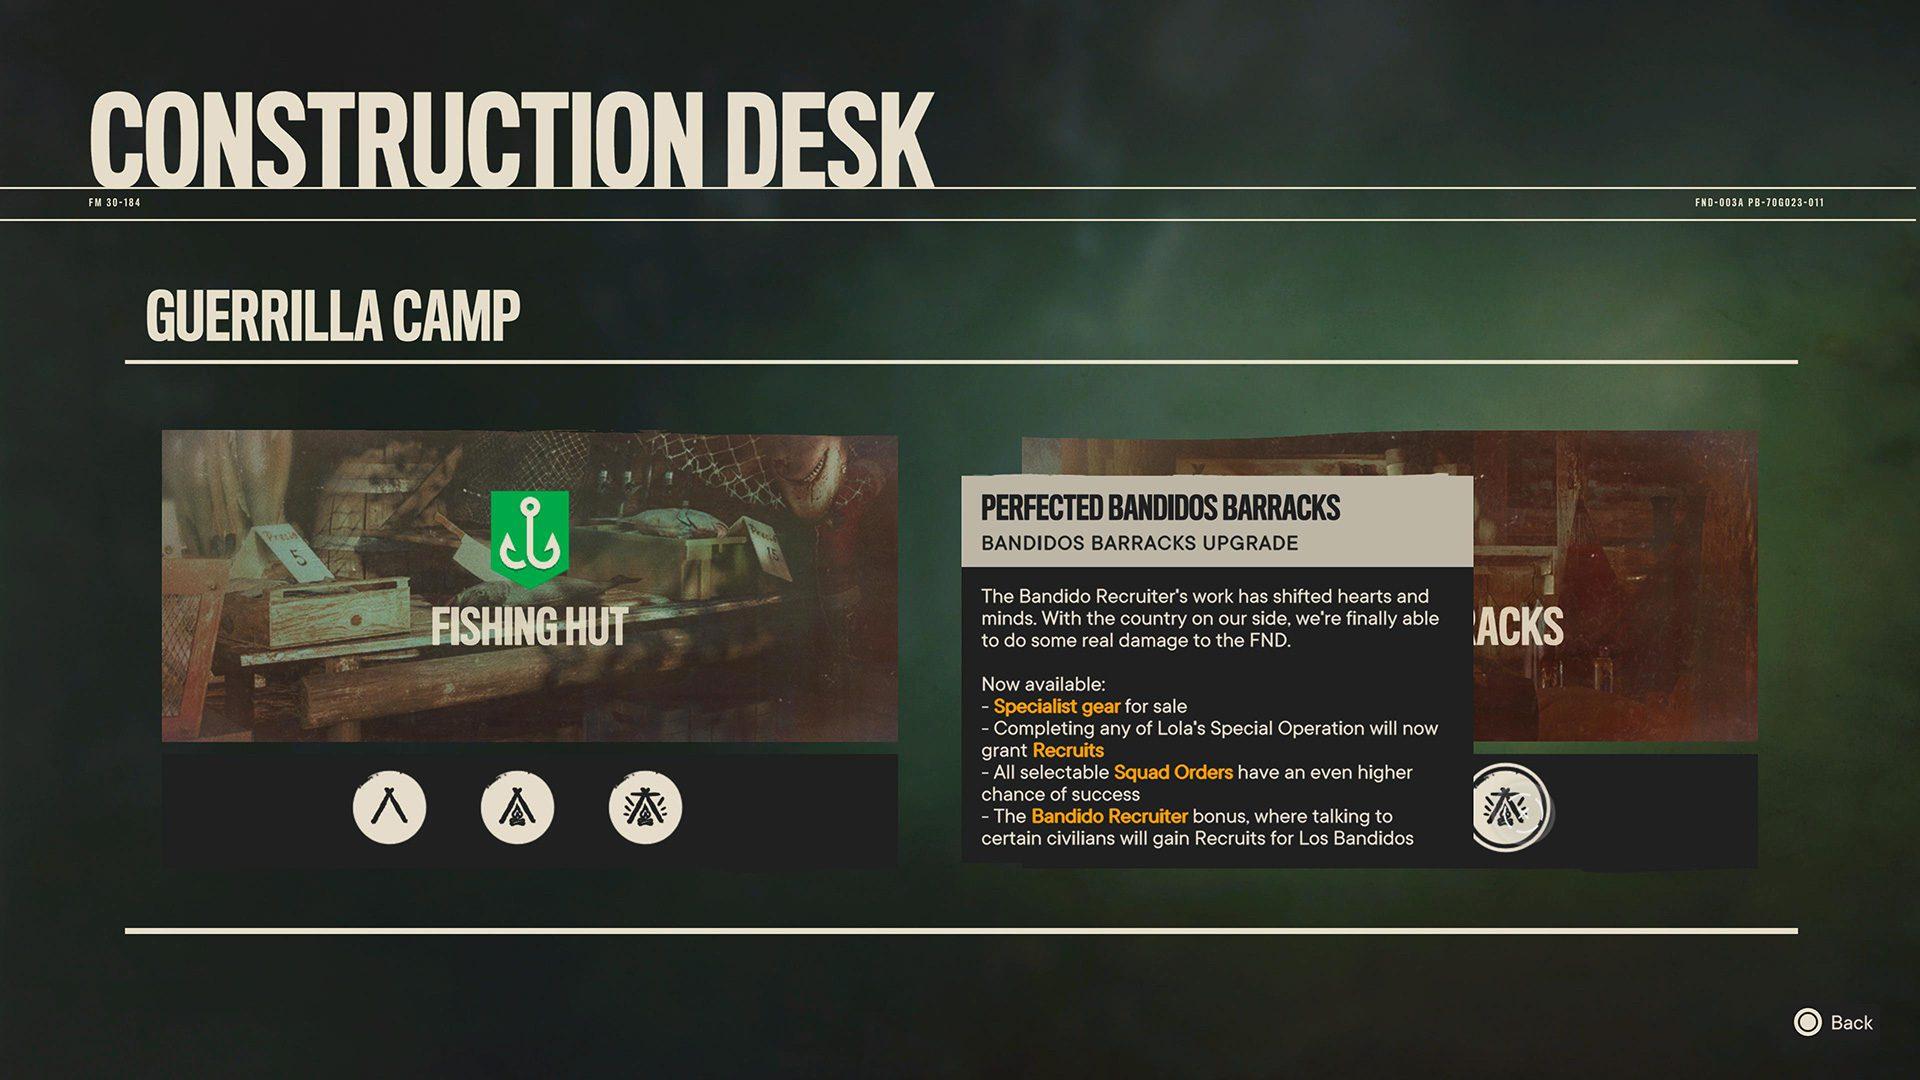 Perfected Bandidos Barracks perks in Far Cry 6